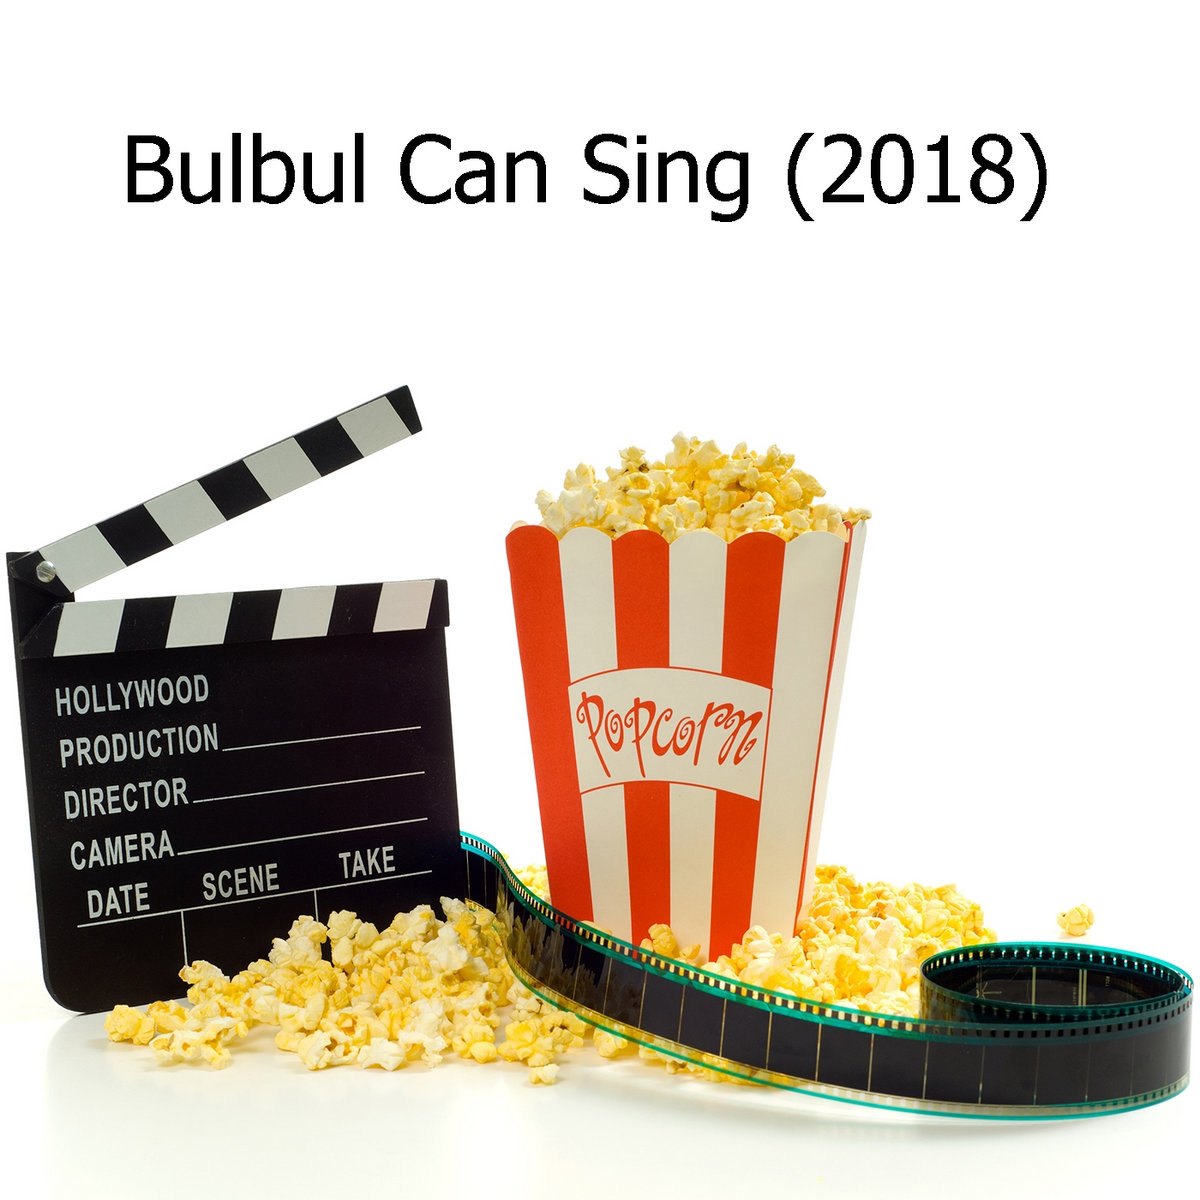 movie 2018 Bulbul Can Sing 720p watch hd | taoliporneback